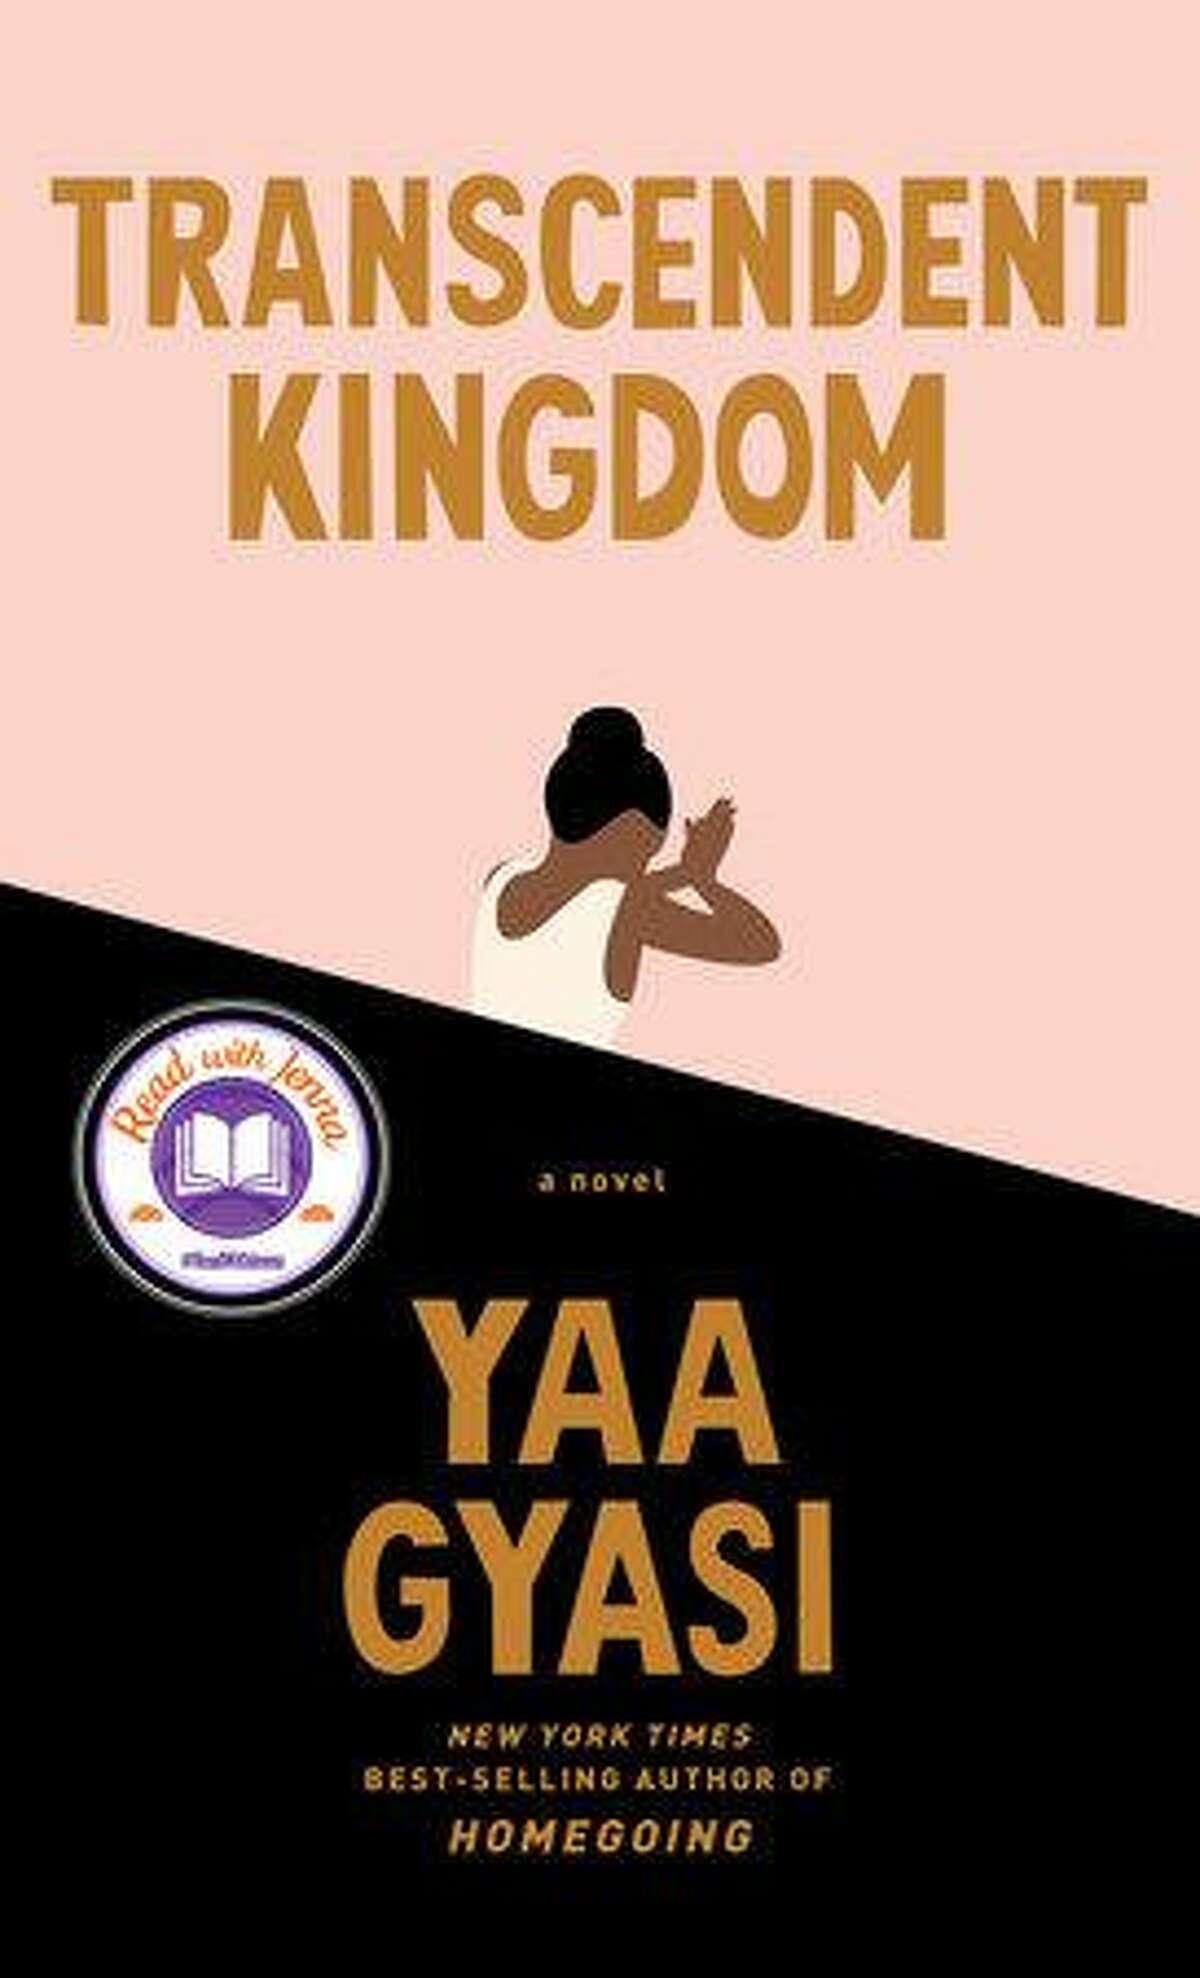 """Transcendent Kingdom"" is Yaa Gyasi's latest novel."